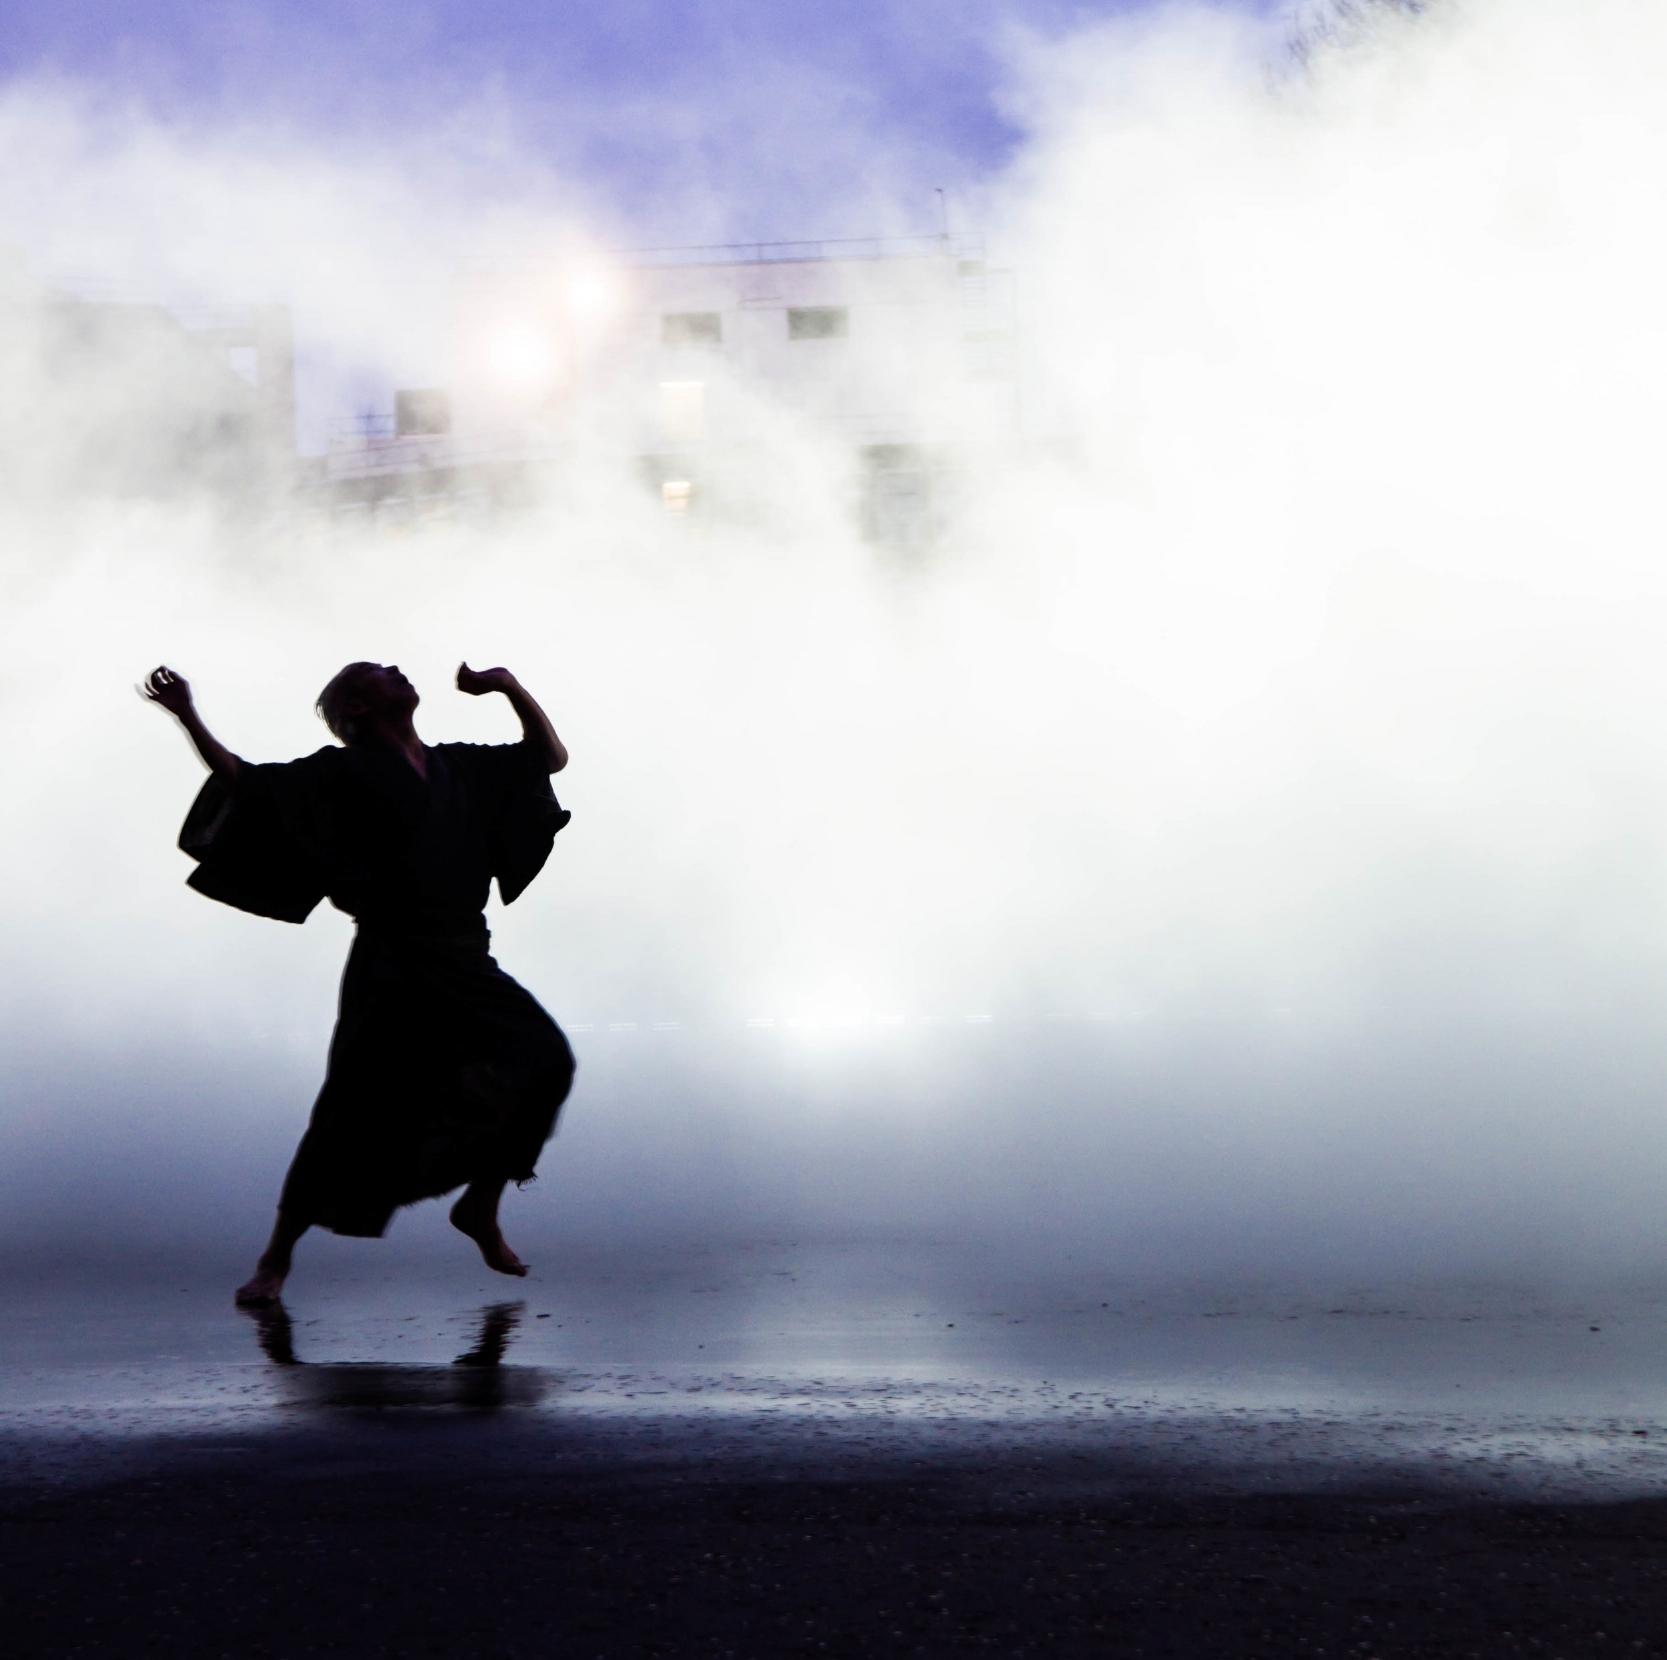 Ten Days Six Nights: Fujiko Nakaya and Min Tanaka